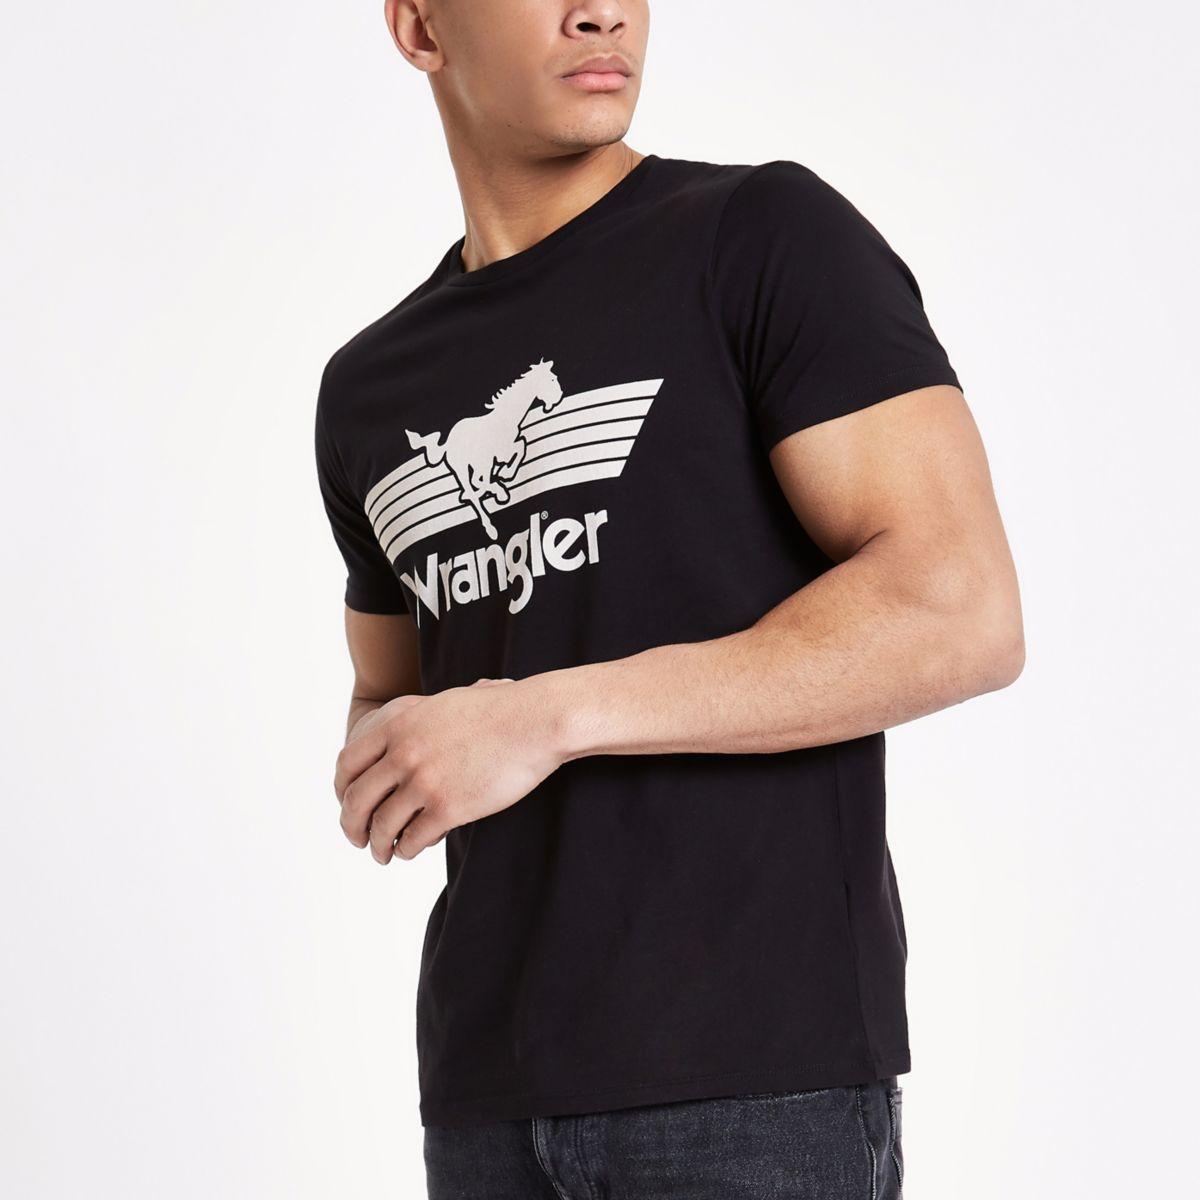 Wrangler – Schwarzes T-Shirt mit Logoprint